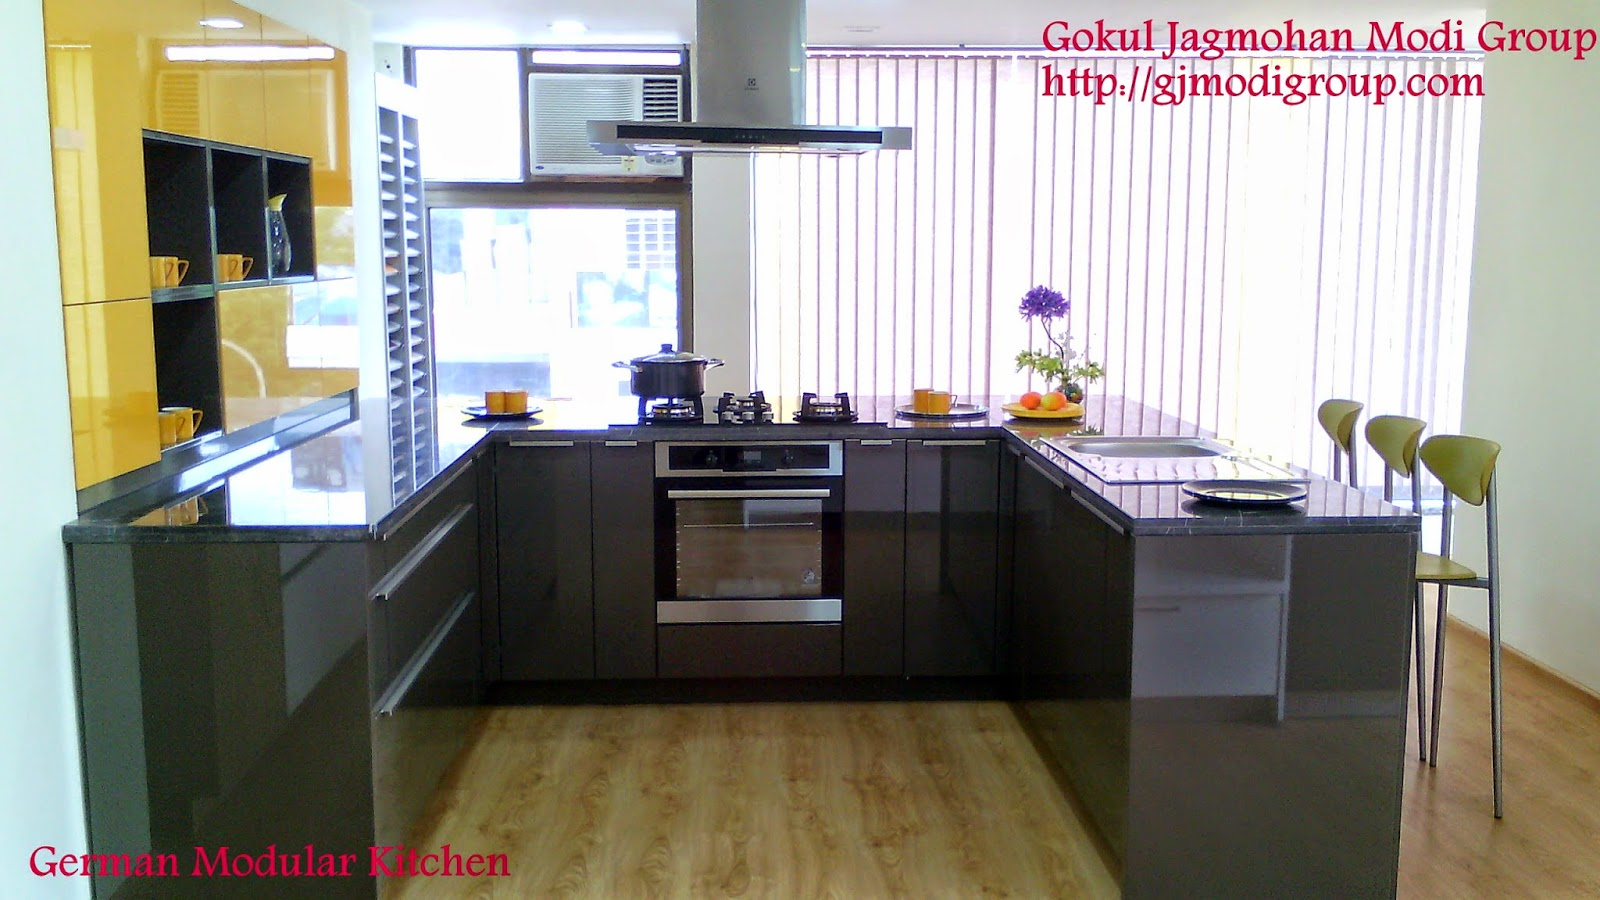 German modular kitchen german modular kitchen in jaipur for German modular kitchen designs